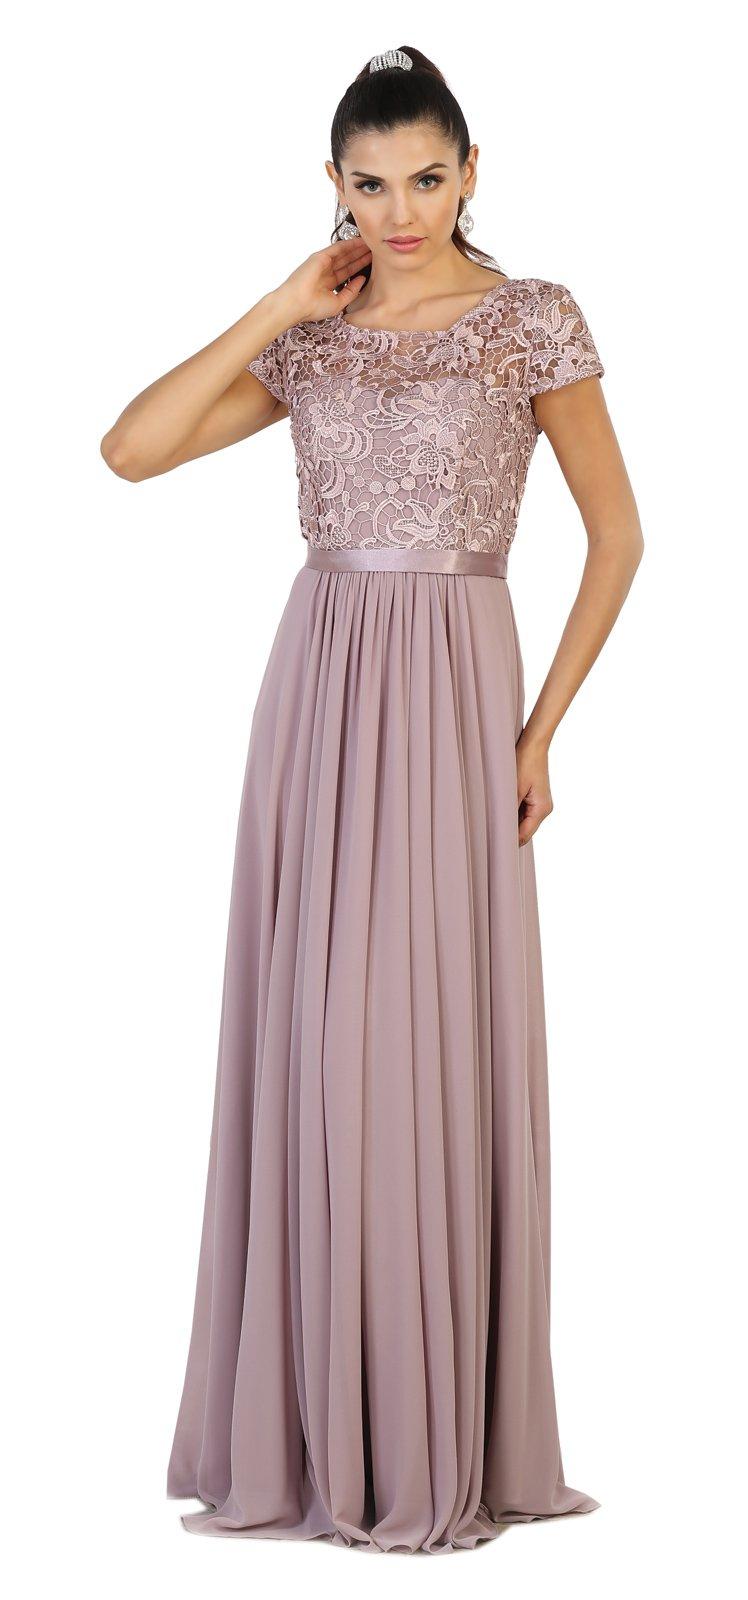 b677aca26ee1 May Queen MQ1486 Short Sleeve Mother of The Bride Evening Dress (L, Mauve)